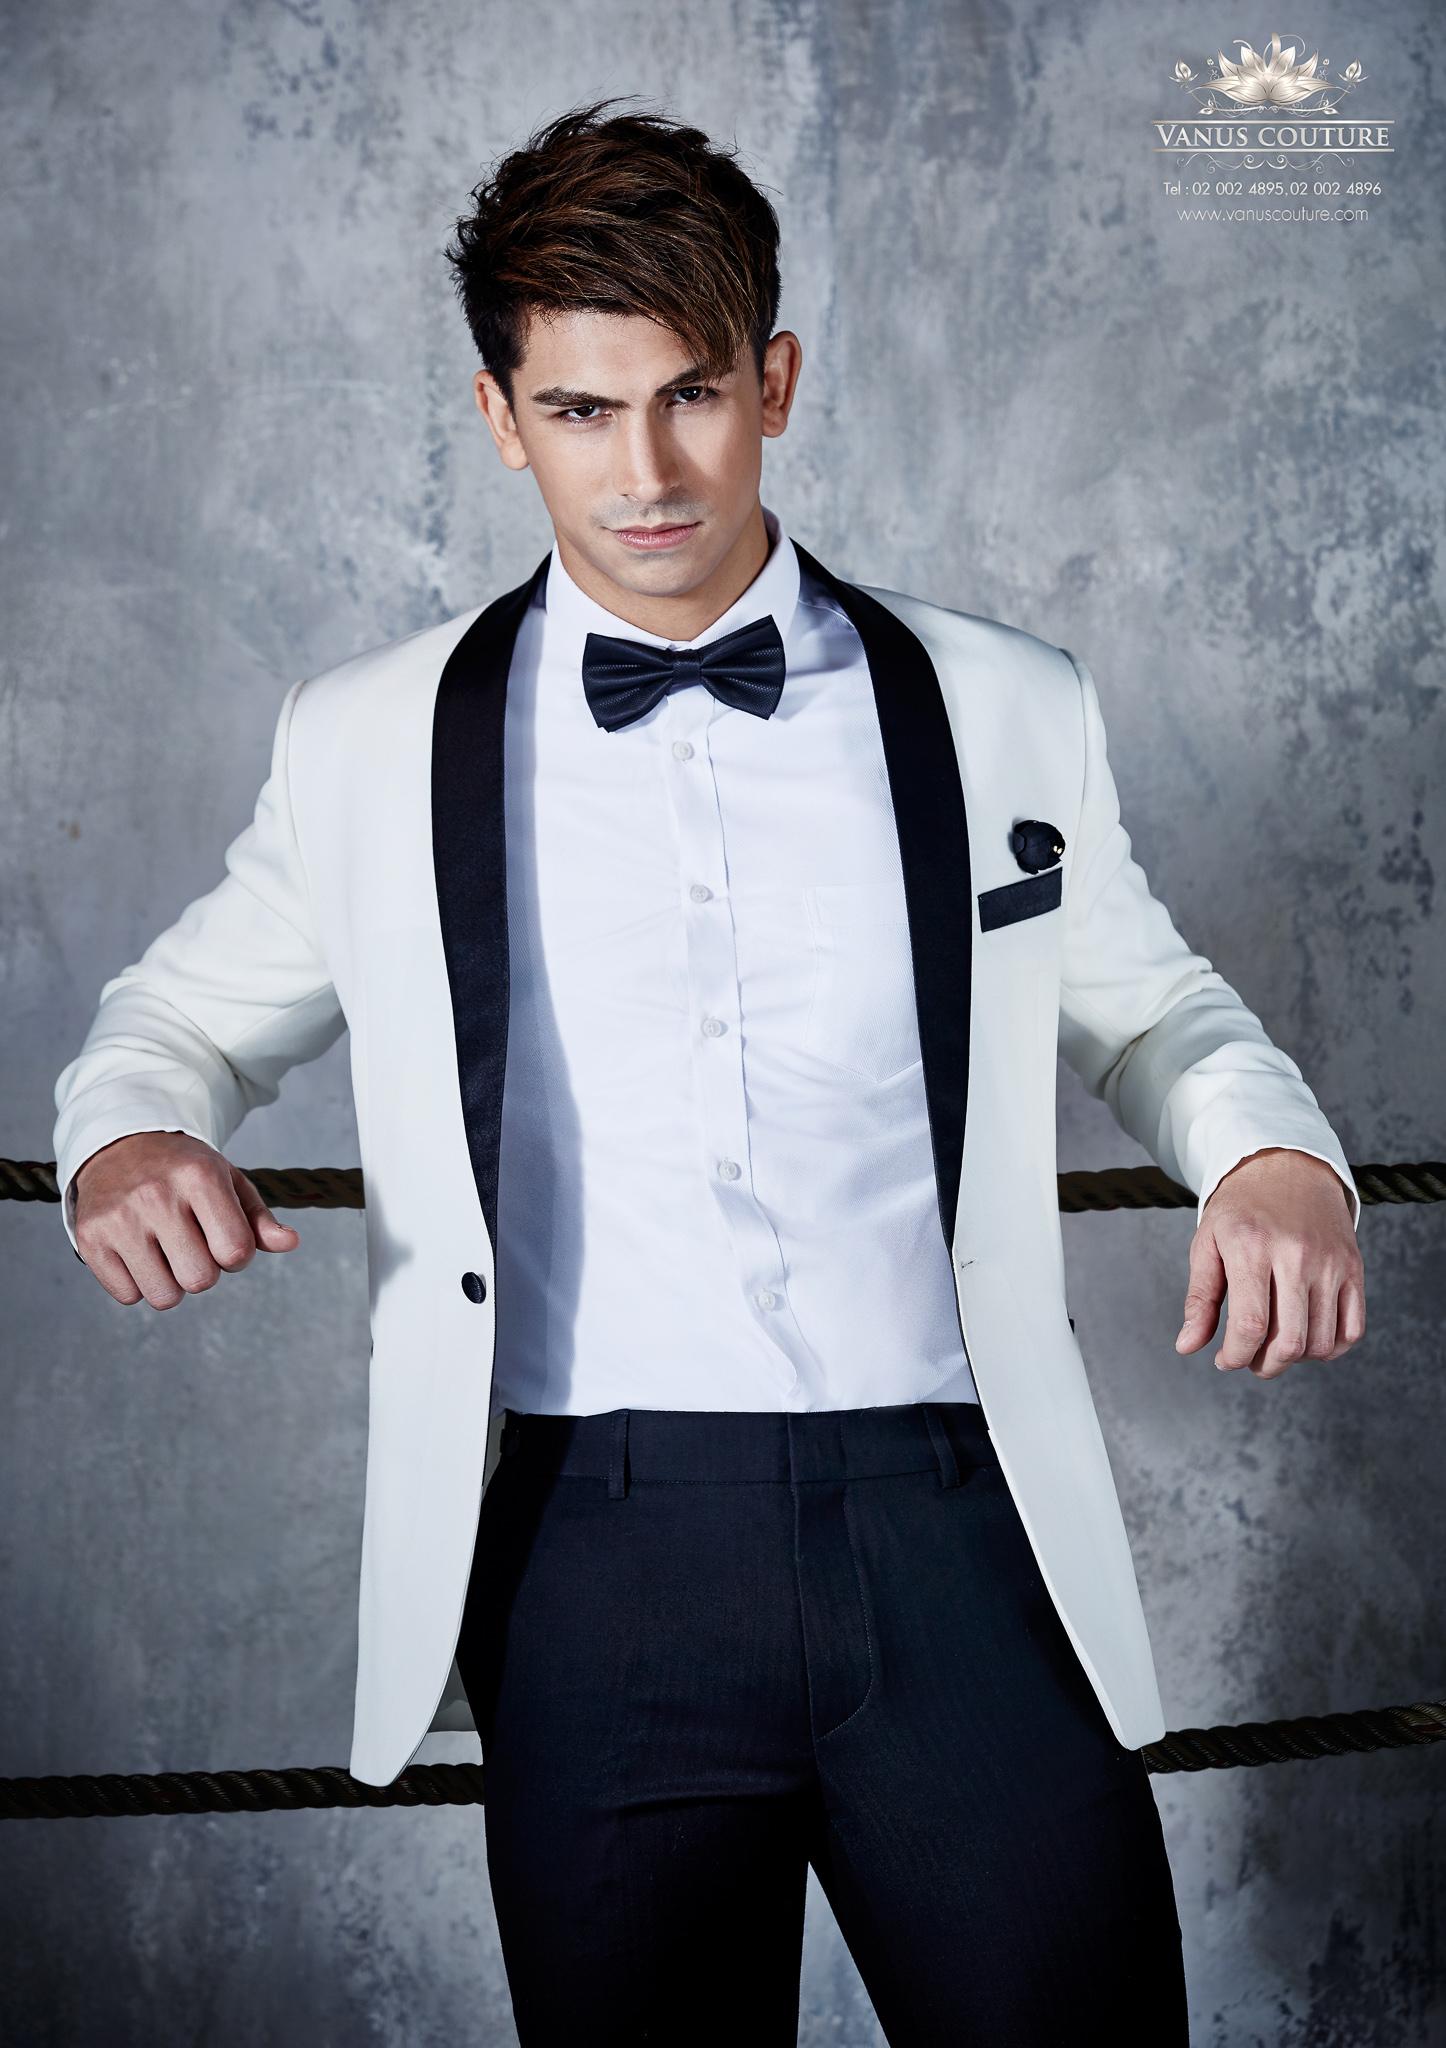 Groom suit - Antoun 05